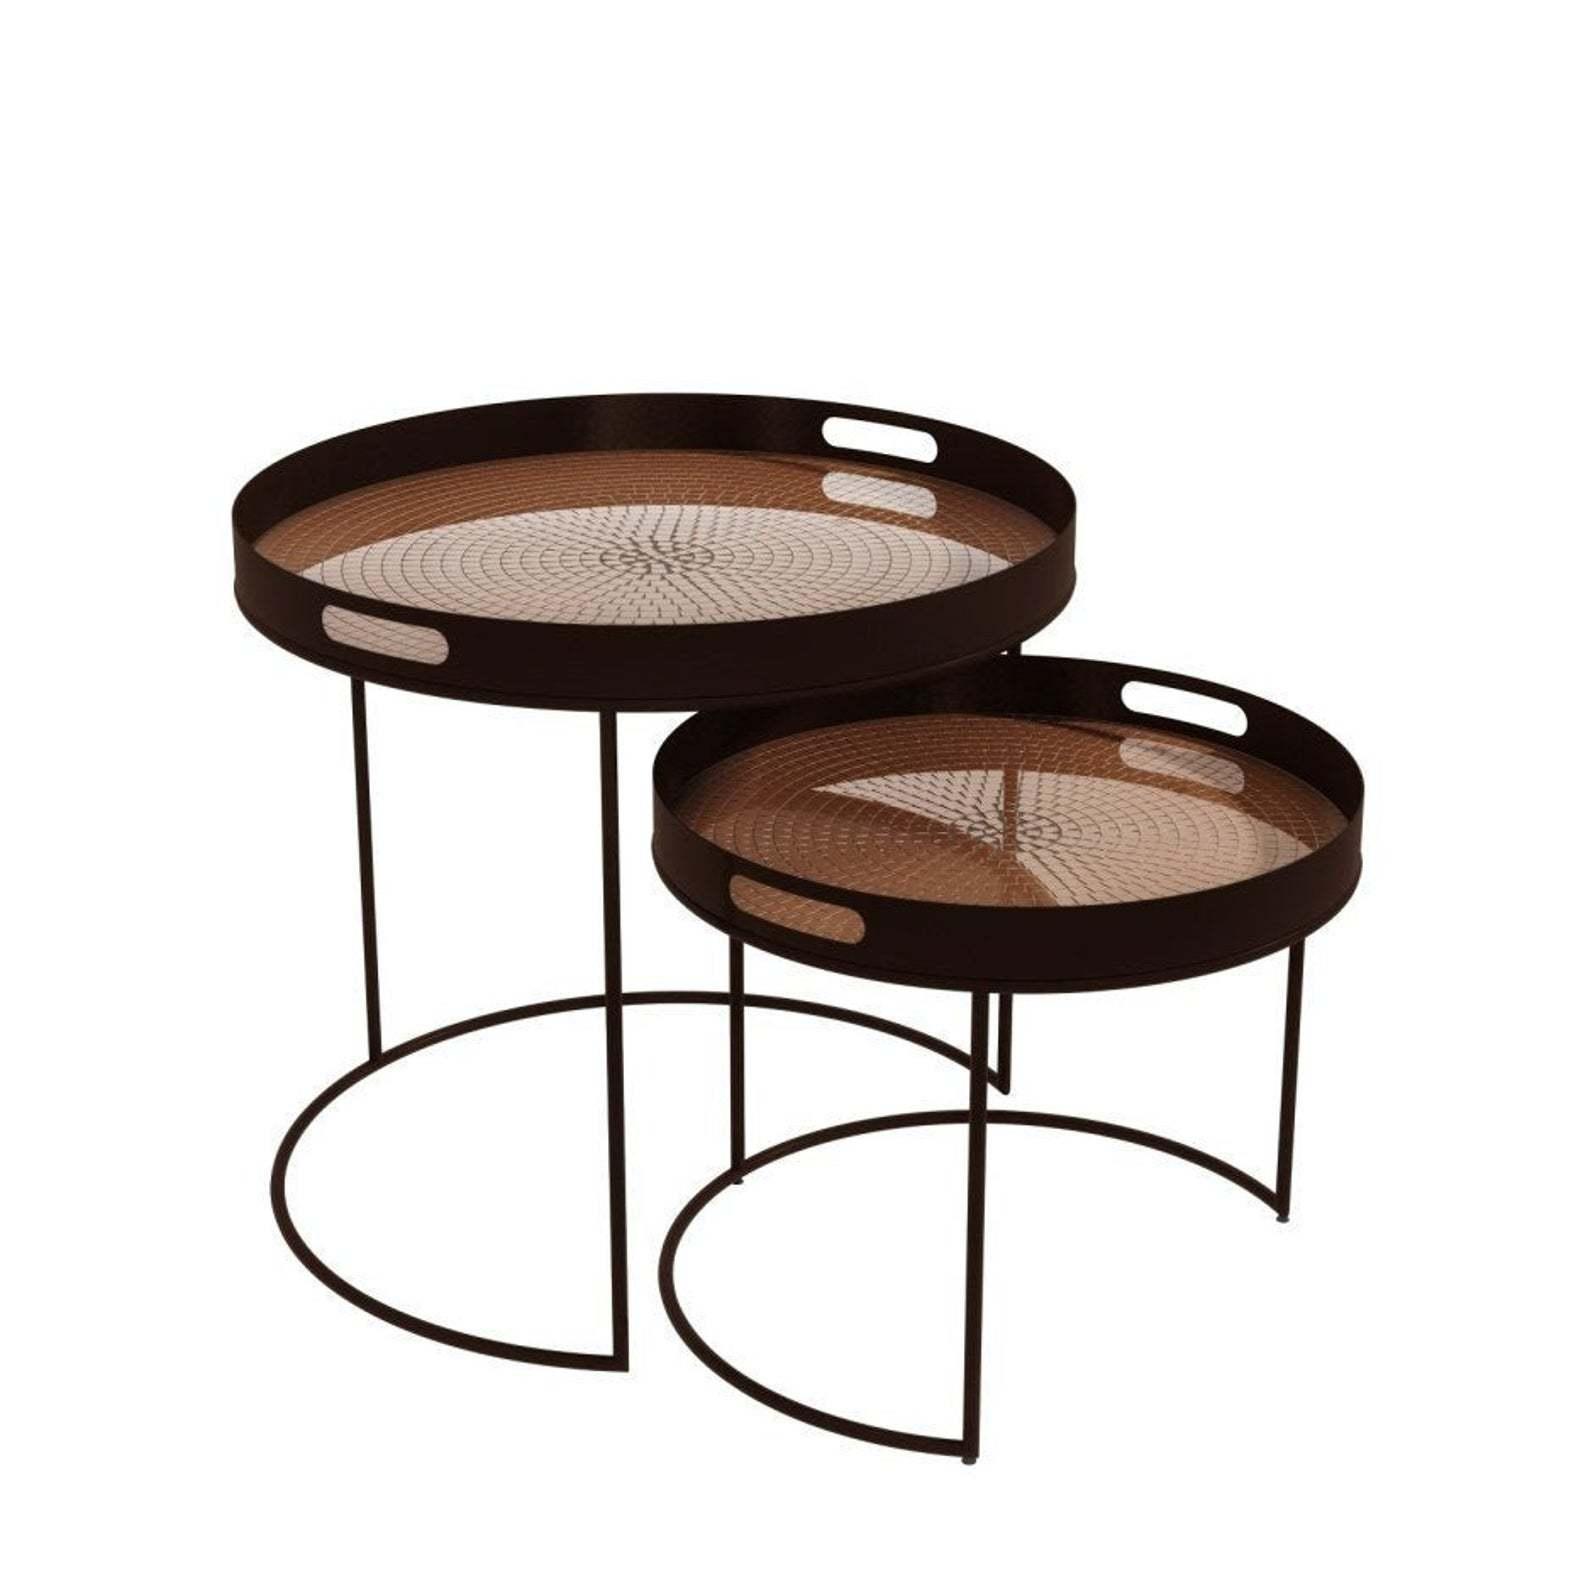 Mid Century Modern set of 2 Round Tables